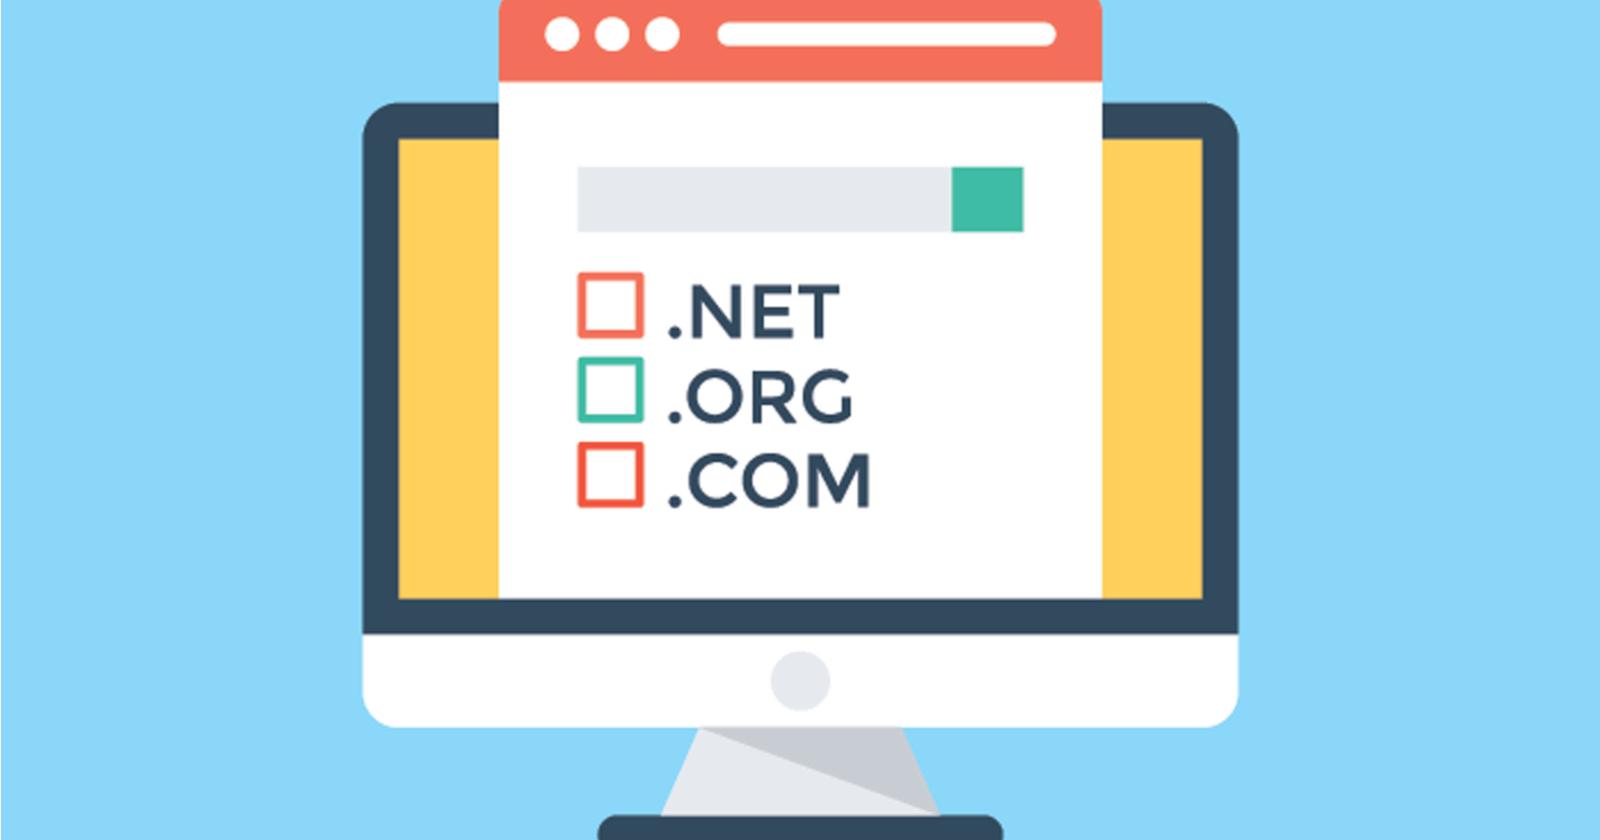 Hướng dẫn cách test Website khi chưa trỏ domain về VinaHost